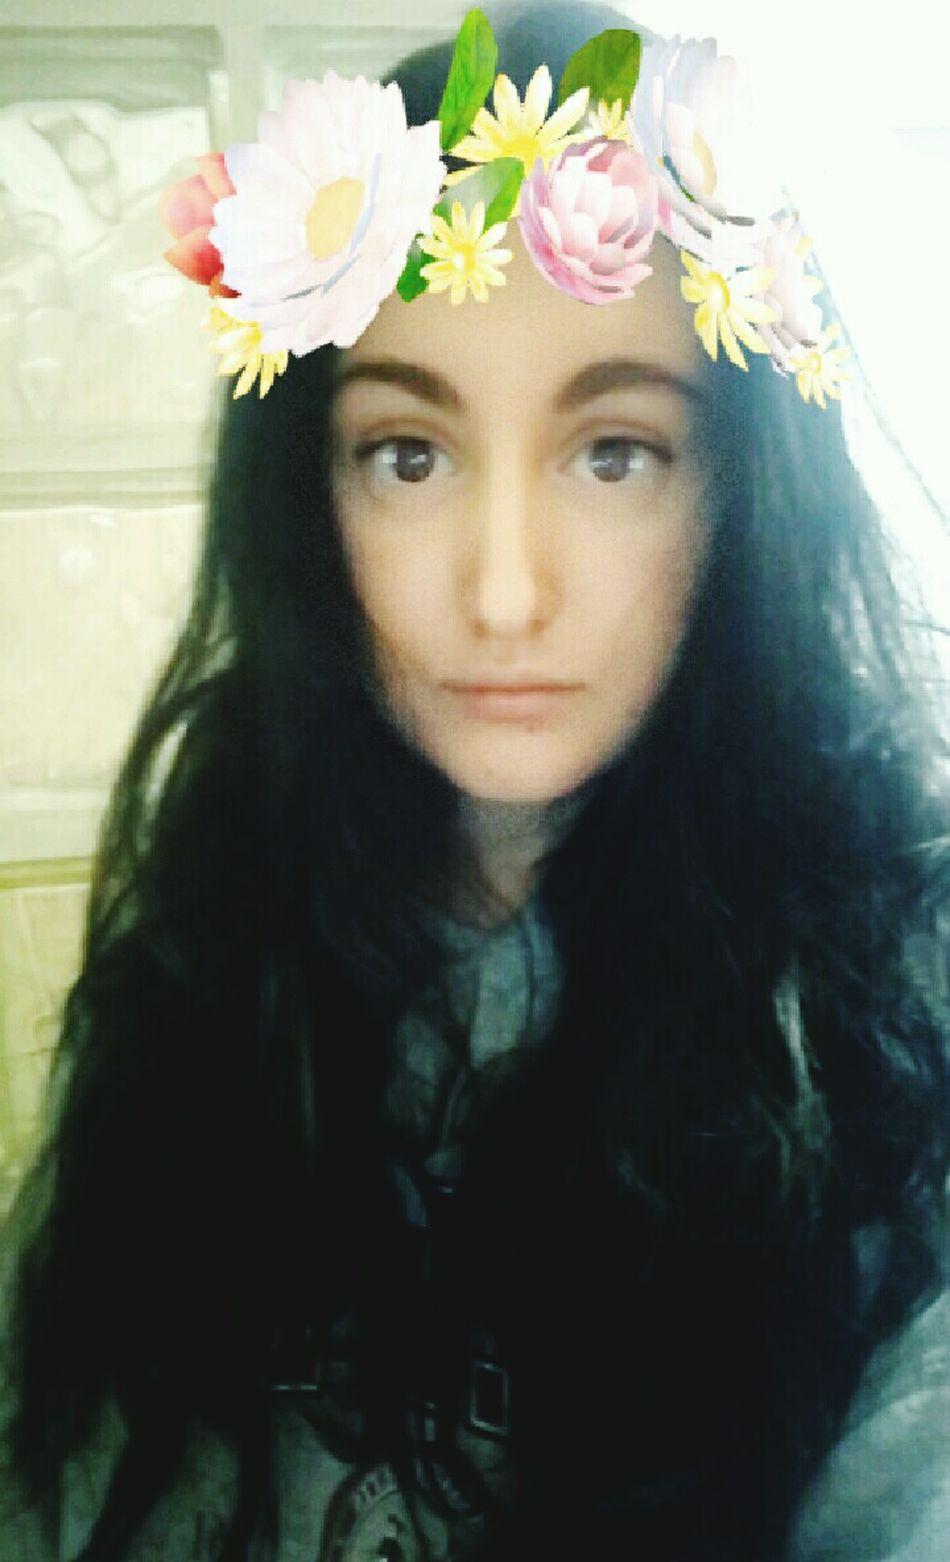 Feeling pretty and feeling sick, good.. Flower Long Hair Beauty Beautiful Woman Young Adult Sexygirl Sexylady Young Women Beautiful Girl Feellikeamodel Snapchat Selfies Feellikeadiva Model Girl SexyGirl.♥ No Make-up No Makeup Cutegirl